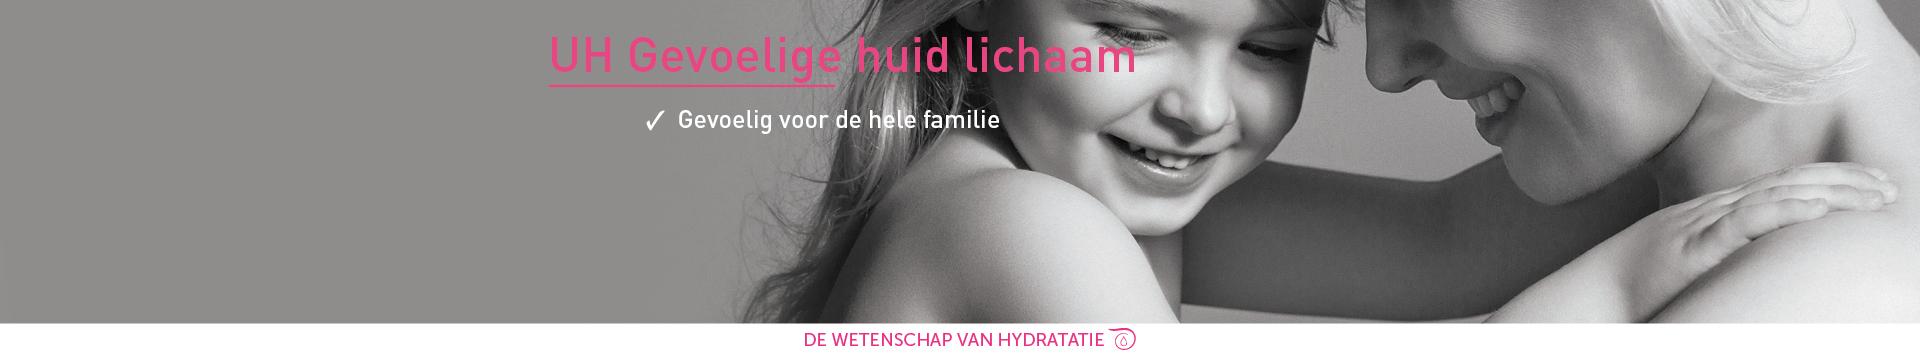 UH - Gevoelige huid Lichaam